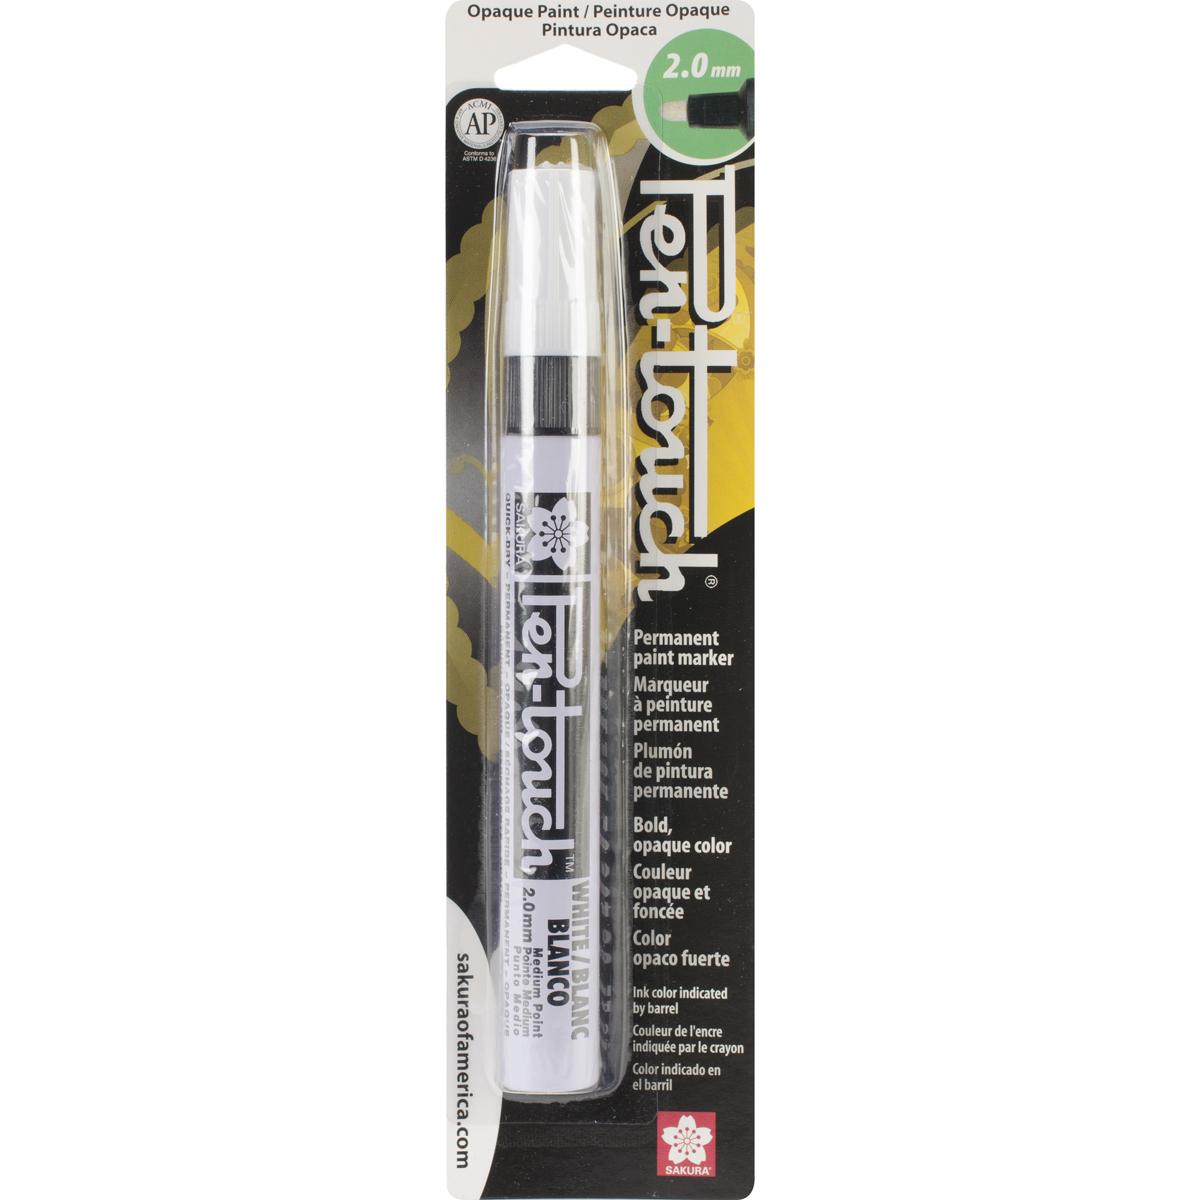 Pen-Touch Paint Marker Medium Point 2mm-White